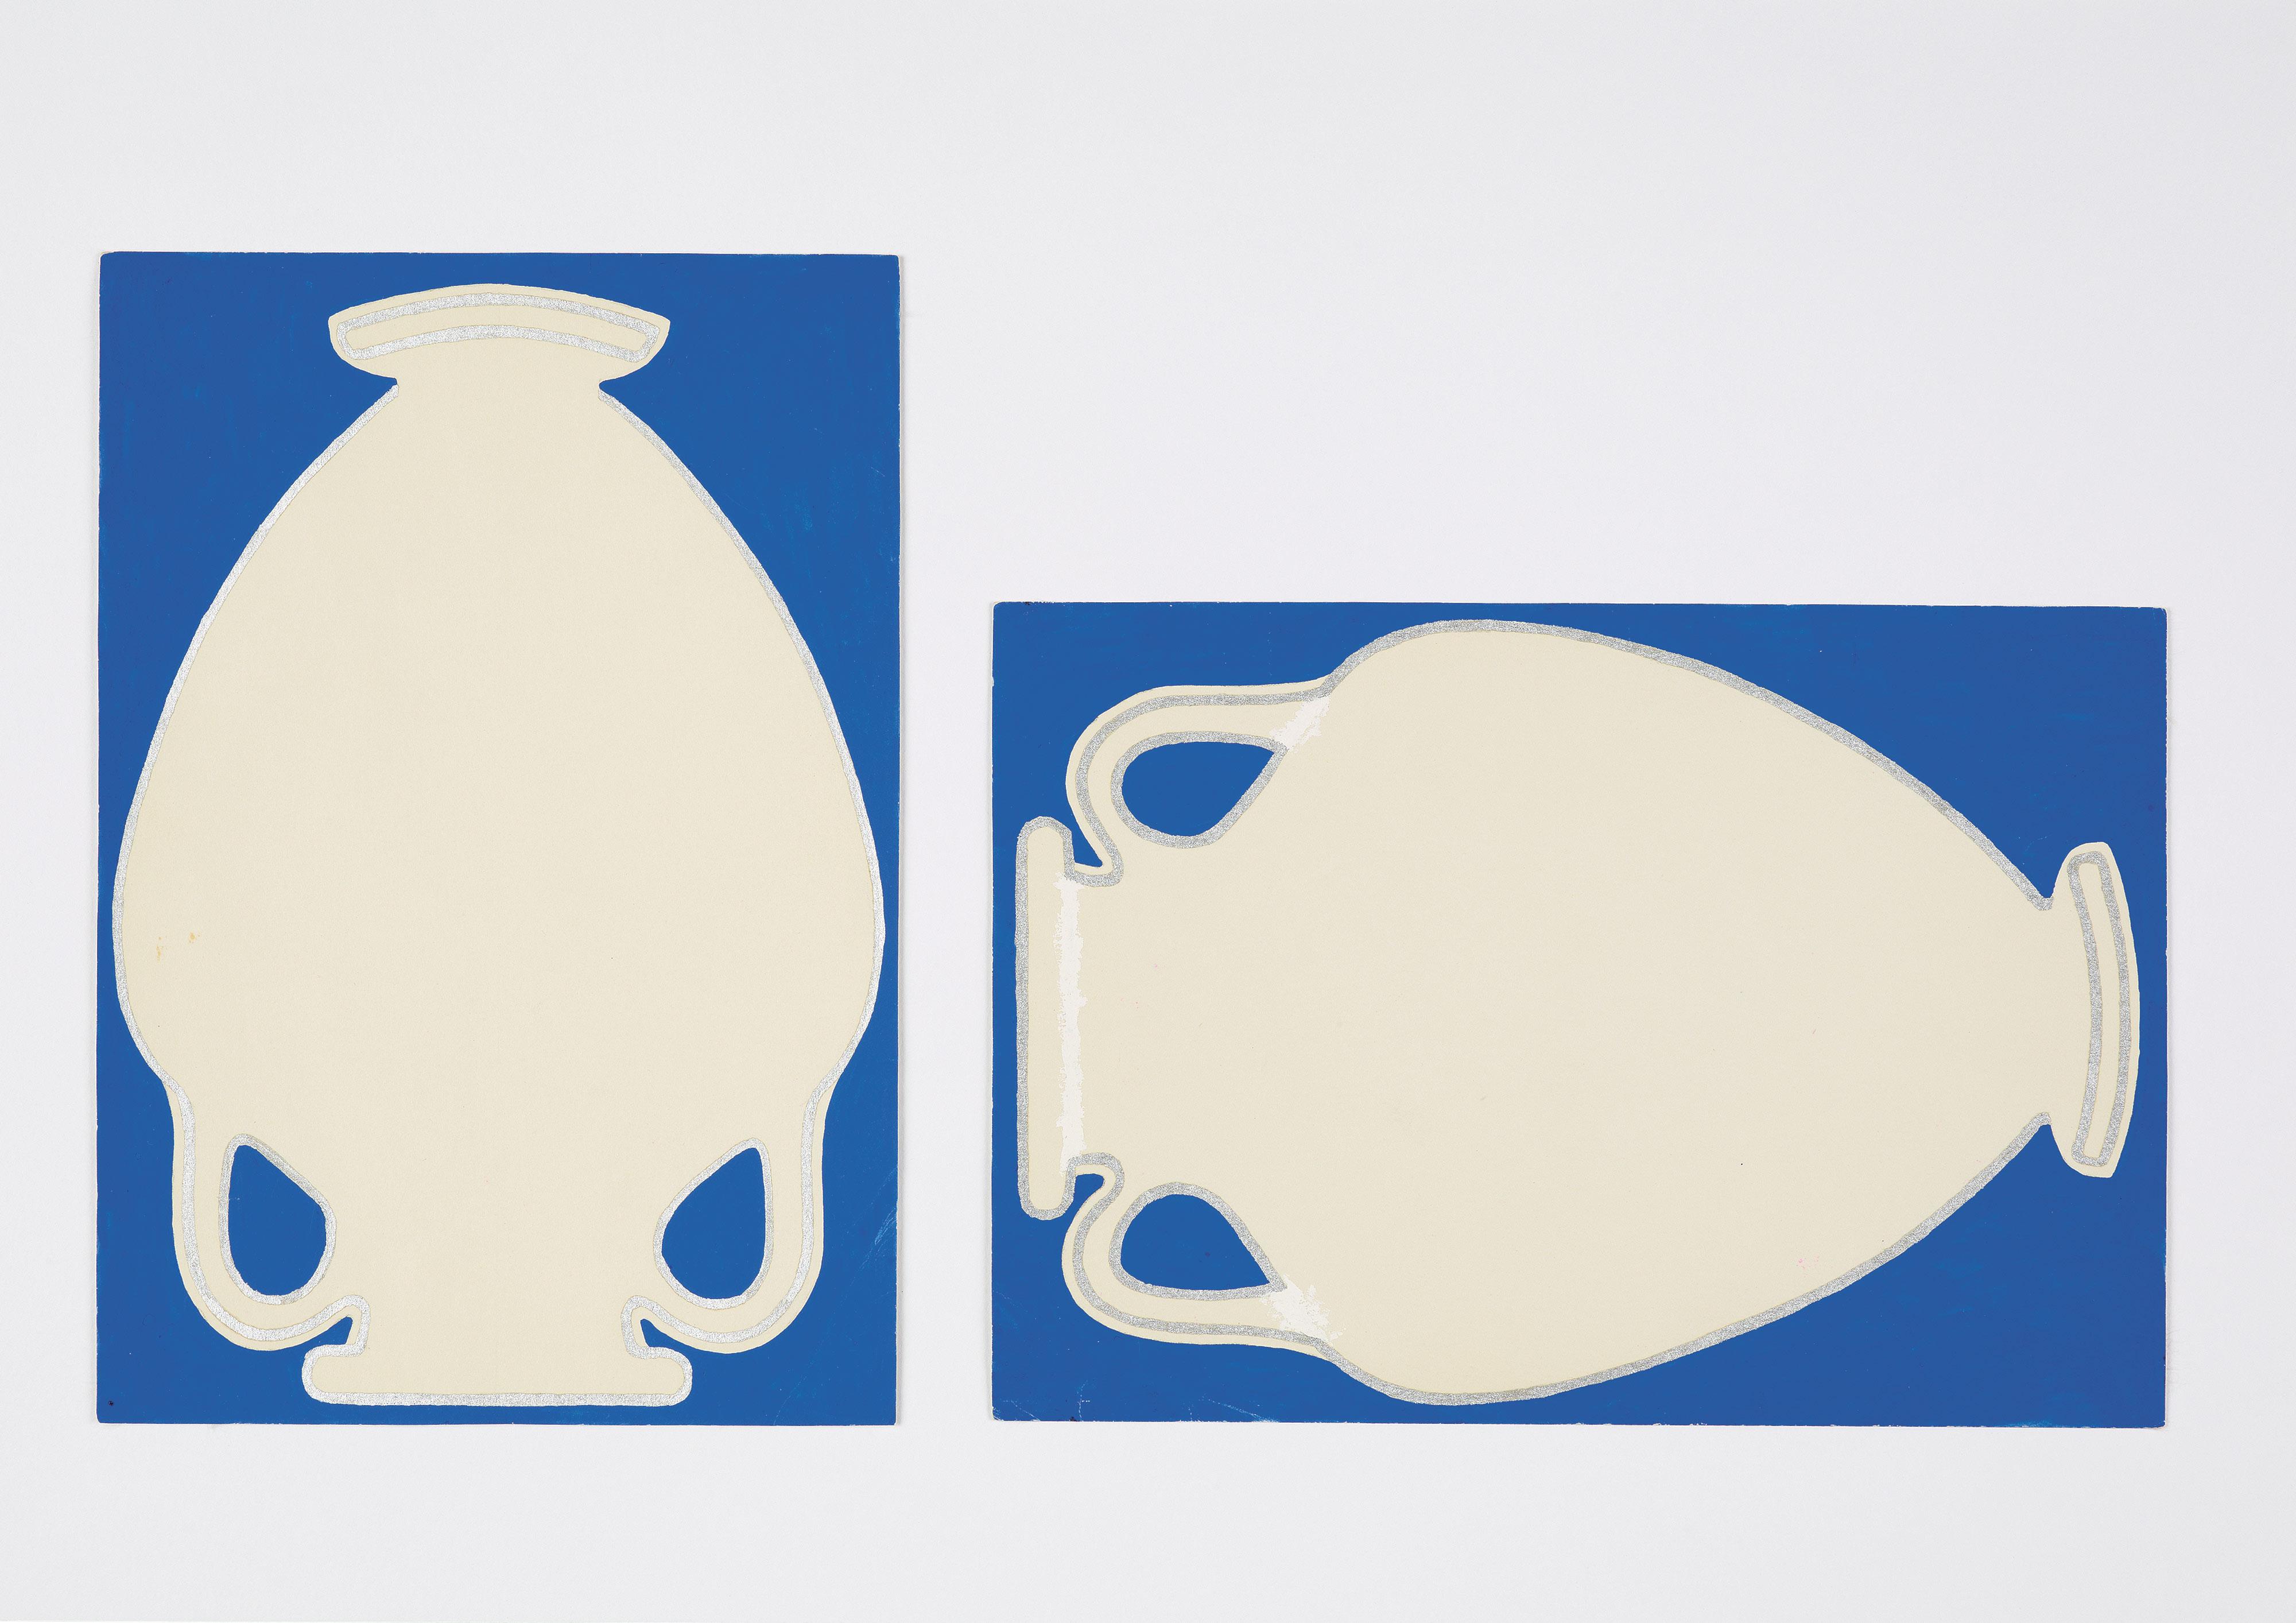 Galerie Barbara Thumm \ Jo Baer \ Untitled (1961 – 1962)